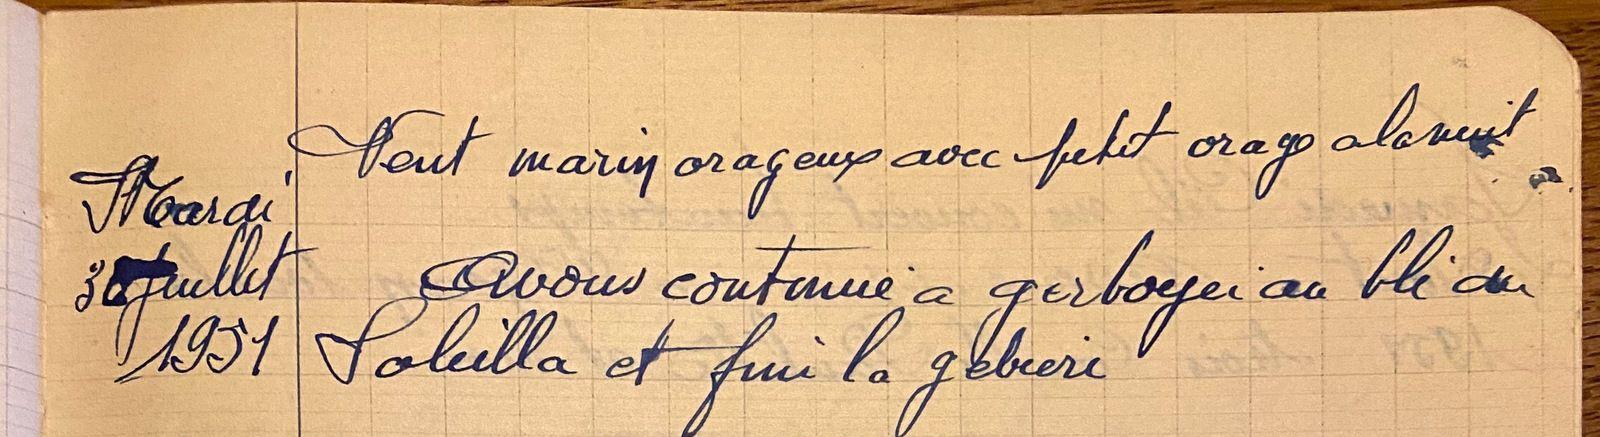 Mardi 31 juillet 1951 - Les gerbes du Souleilla